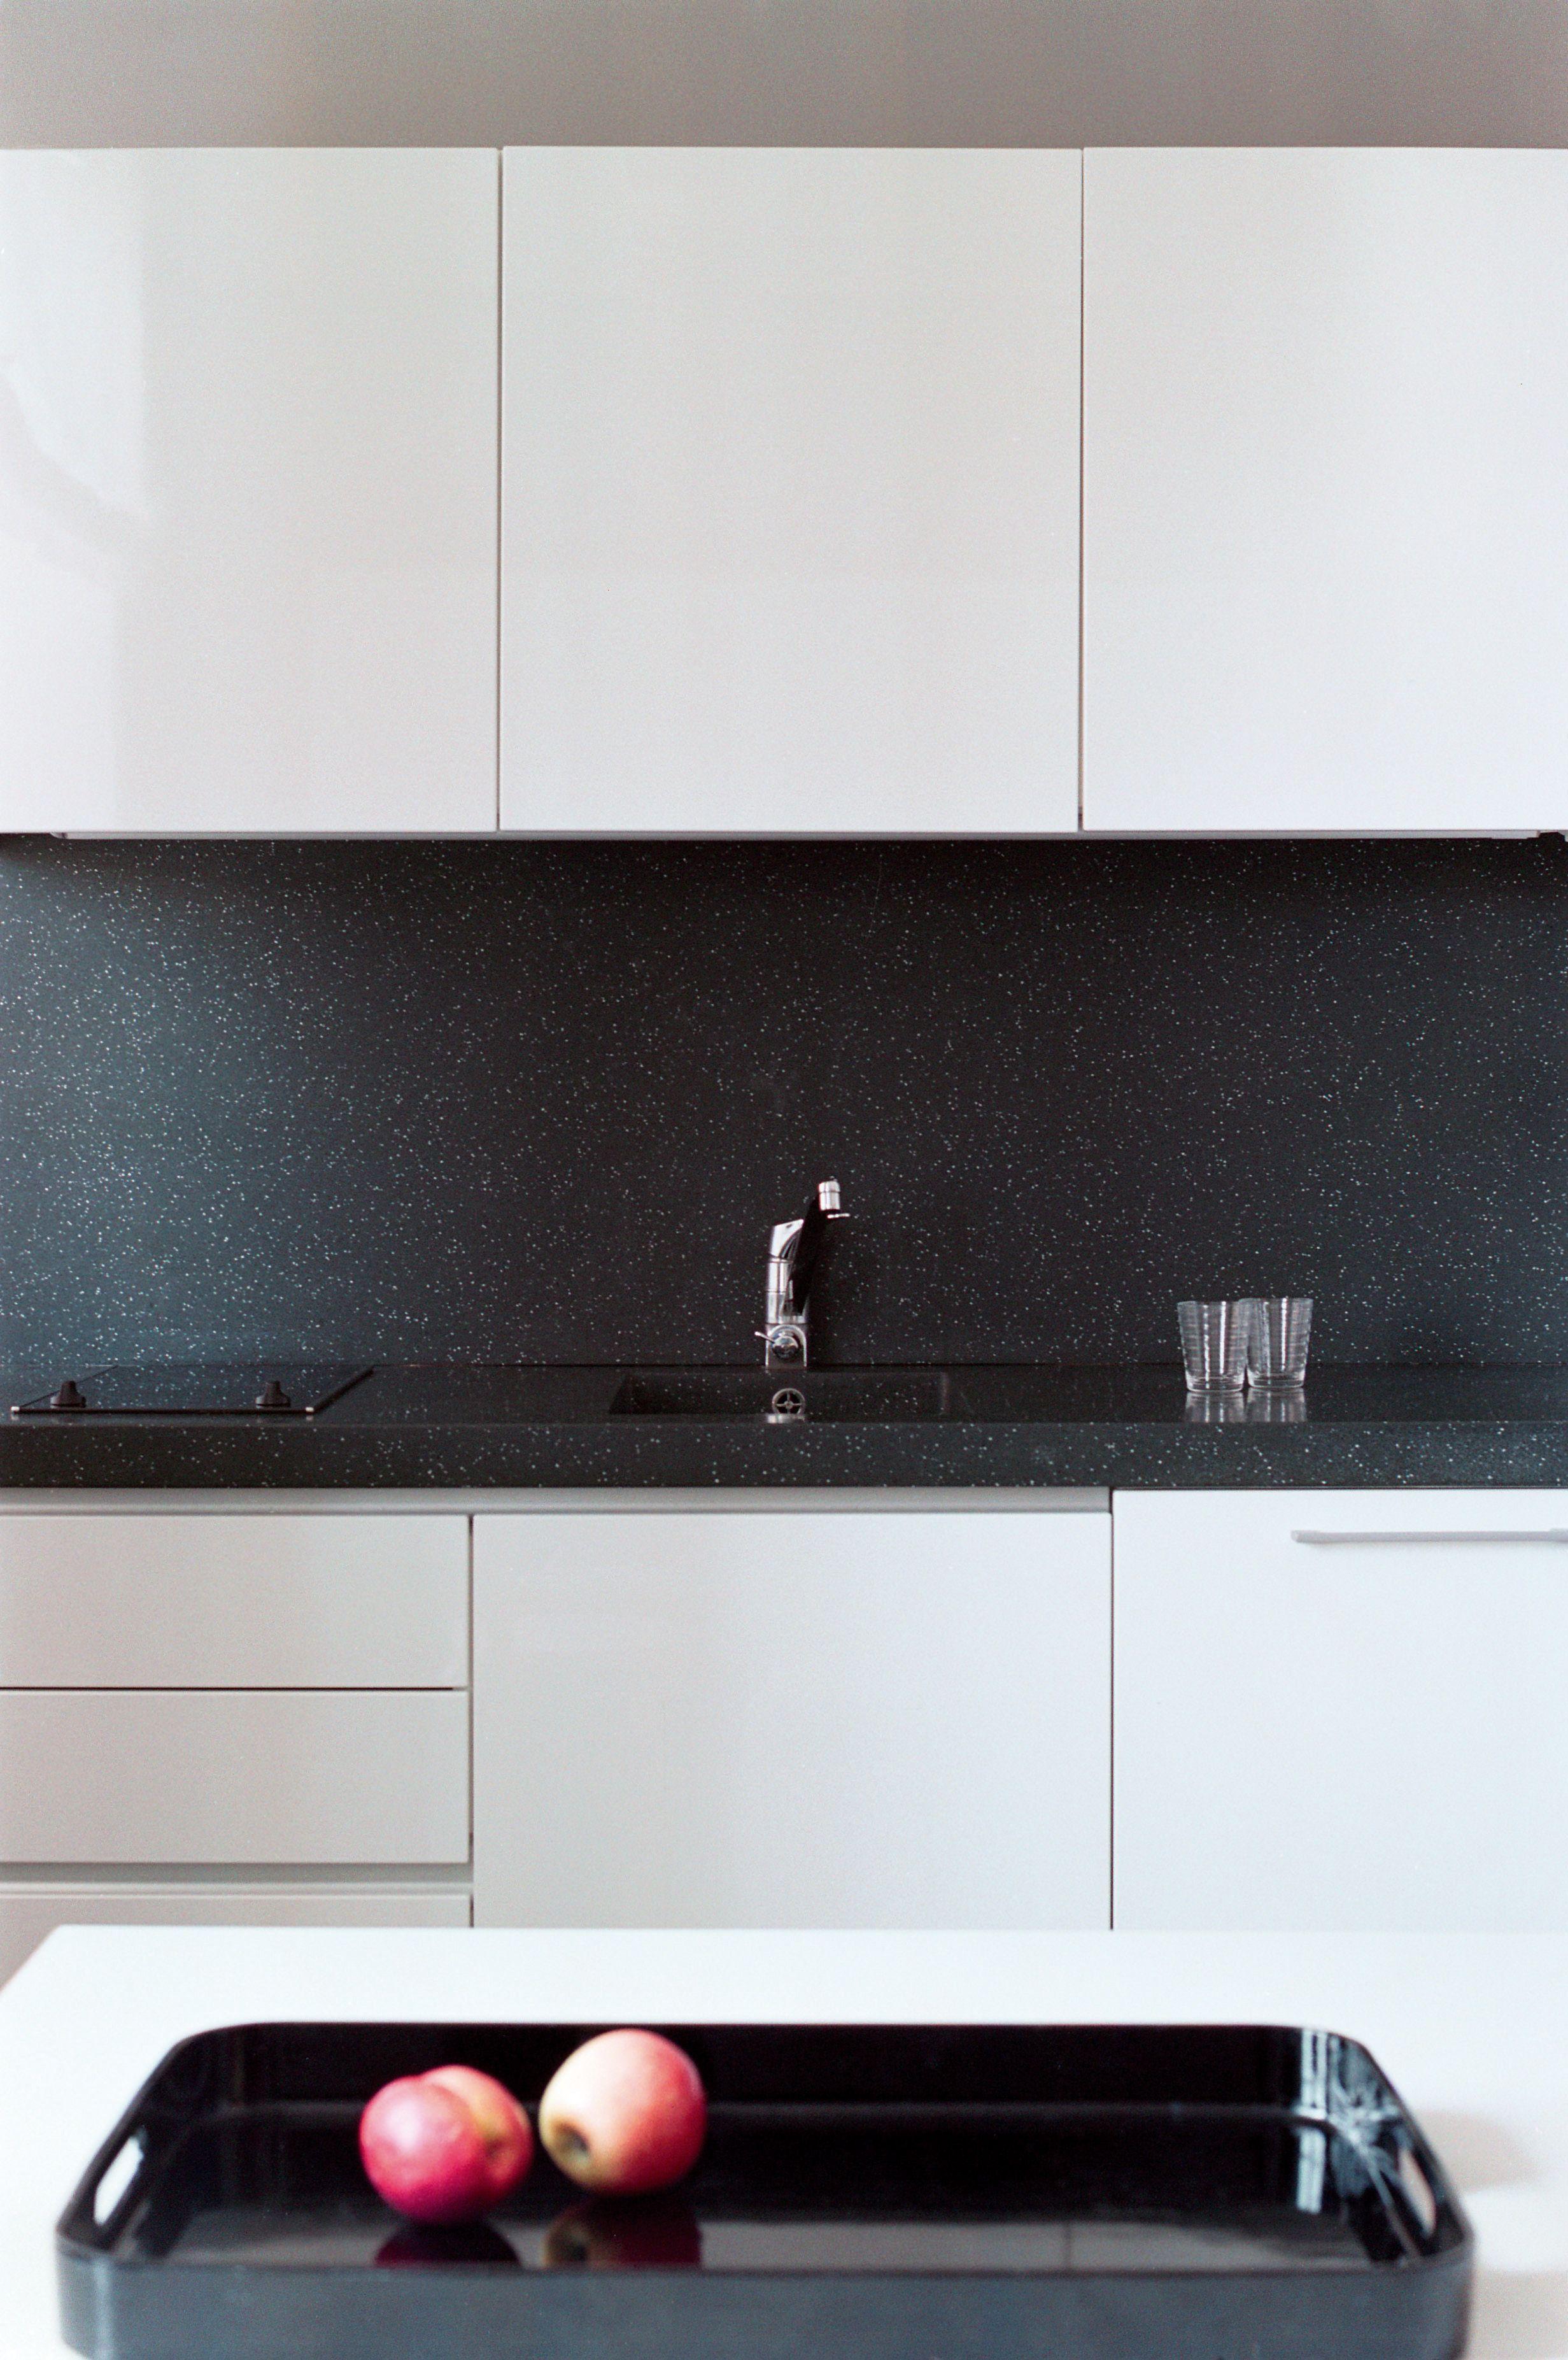 Recycled Sink U0026 Backsplash; Sustainable Materials; Durat Designs